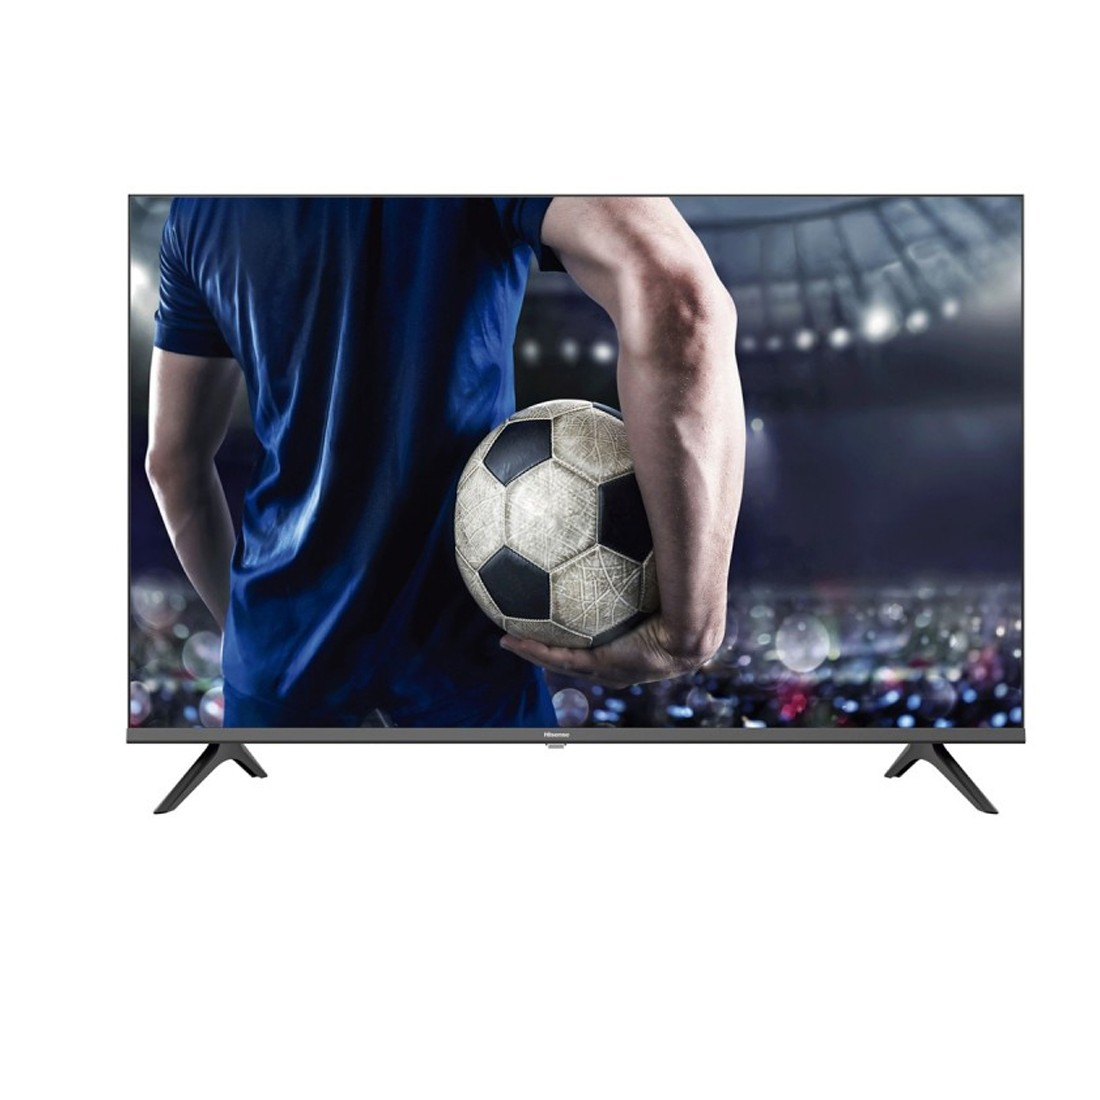 "TV LED - Hisense 40A5100F, Eficiencia A+, 4K, 40"""